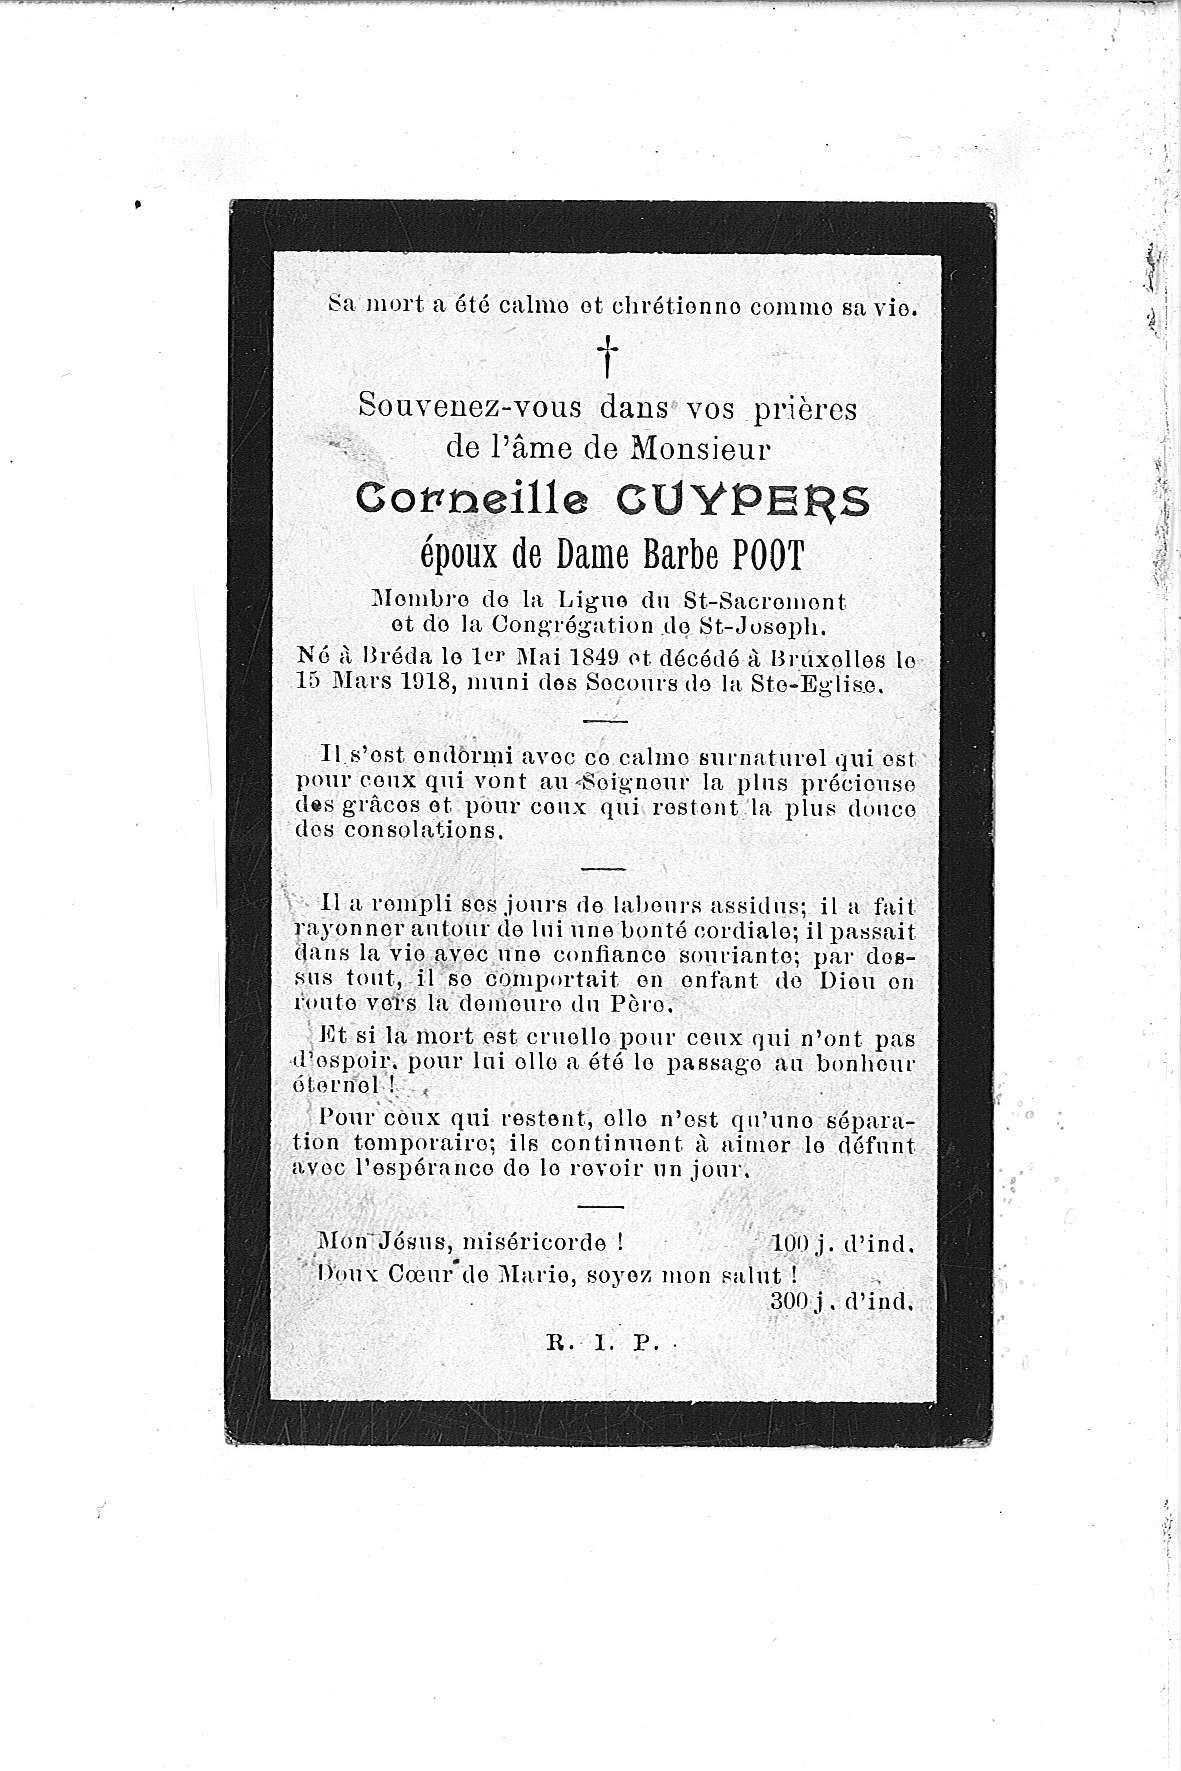 Corneille (1918) 20120123114116_00154.jpg